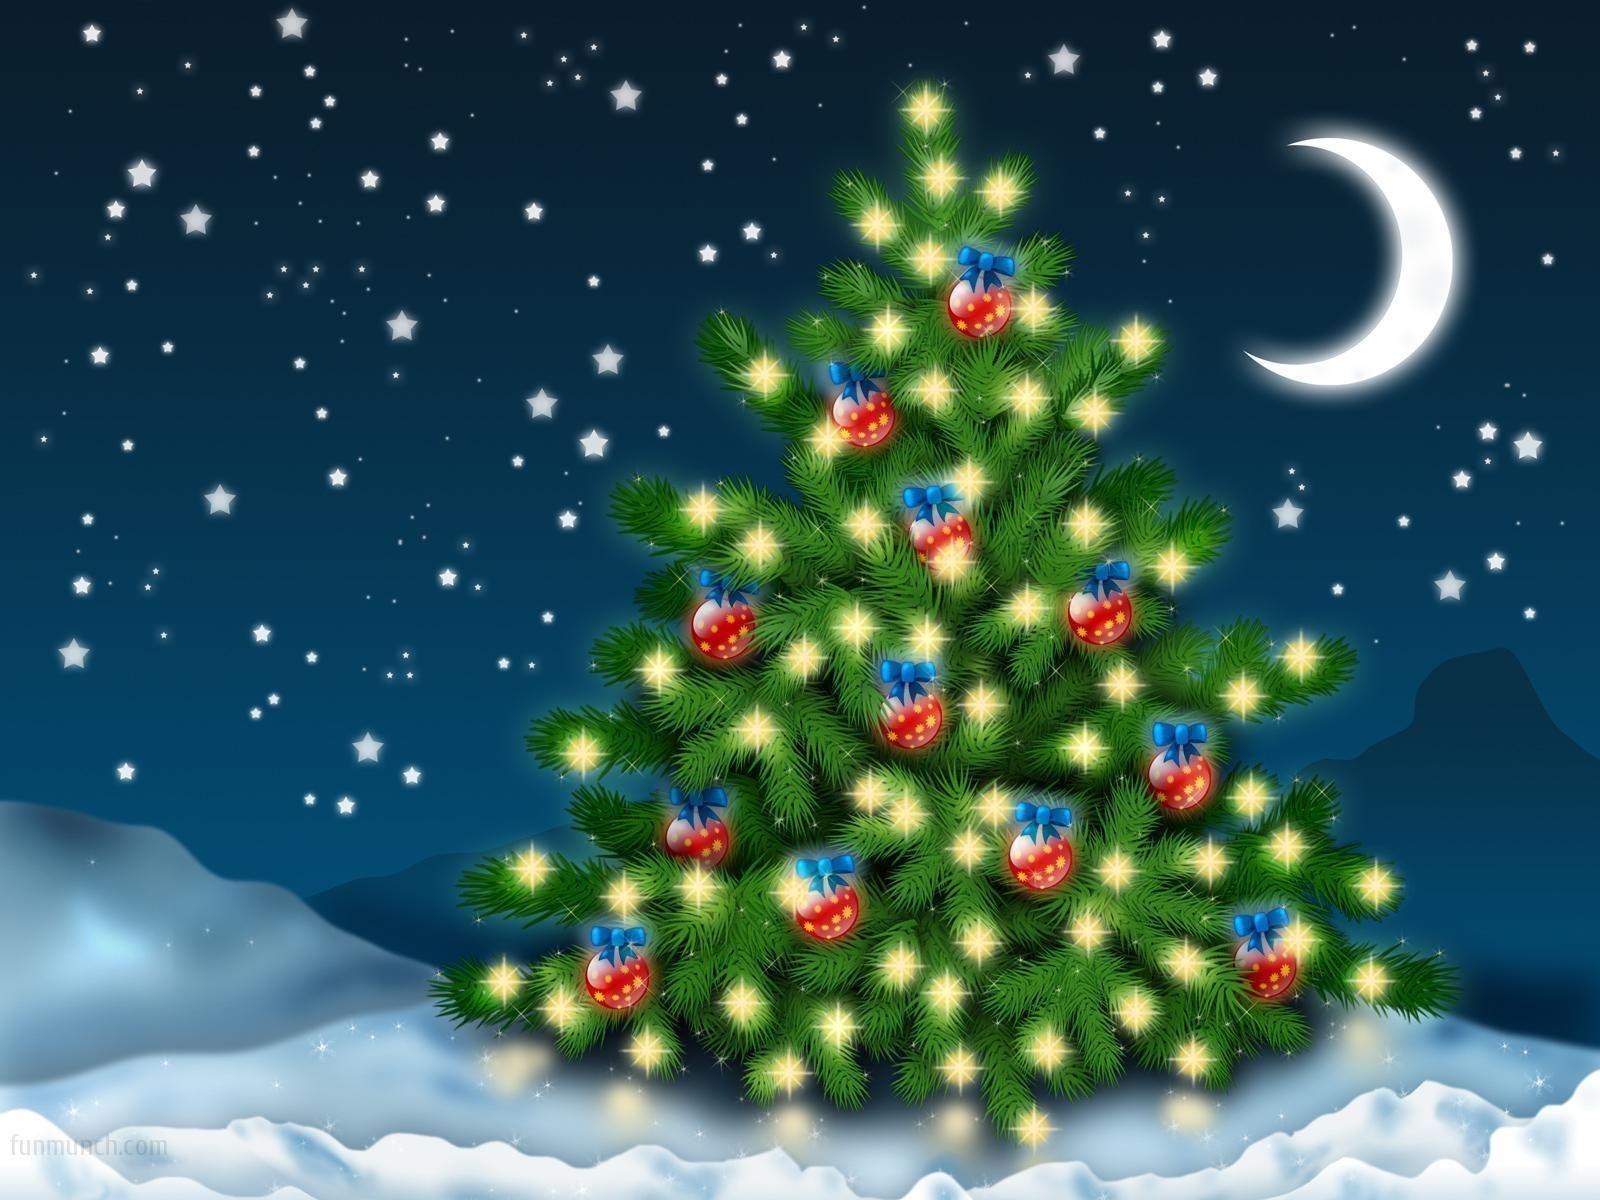 christmas lights pictures - Google Search   christmas lights ...